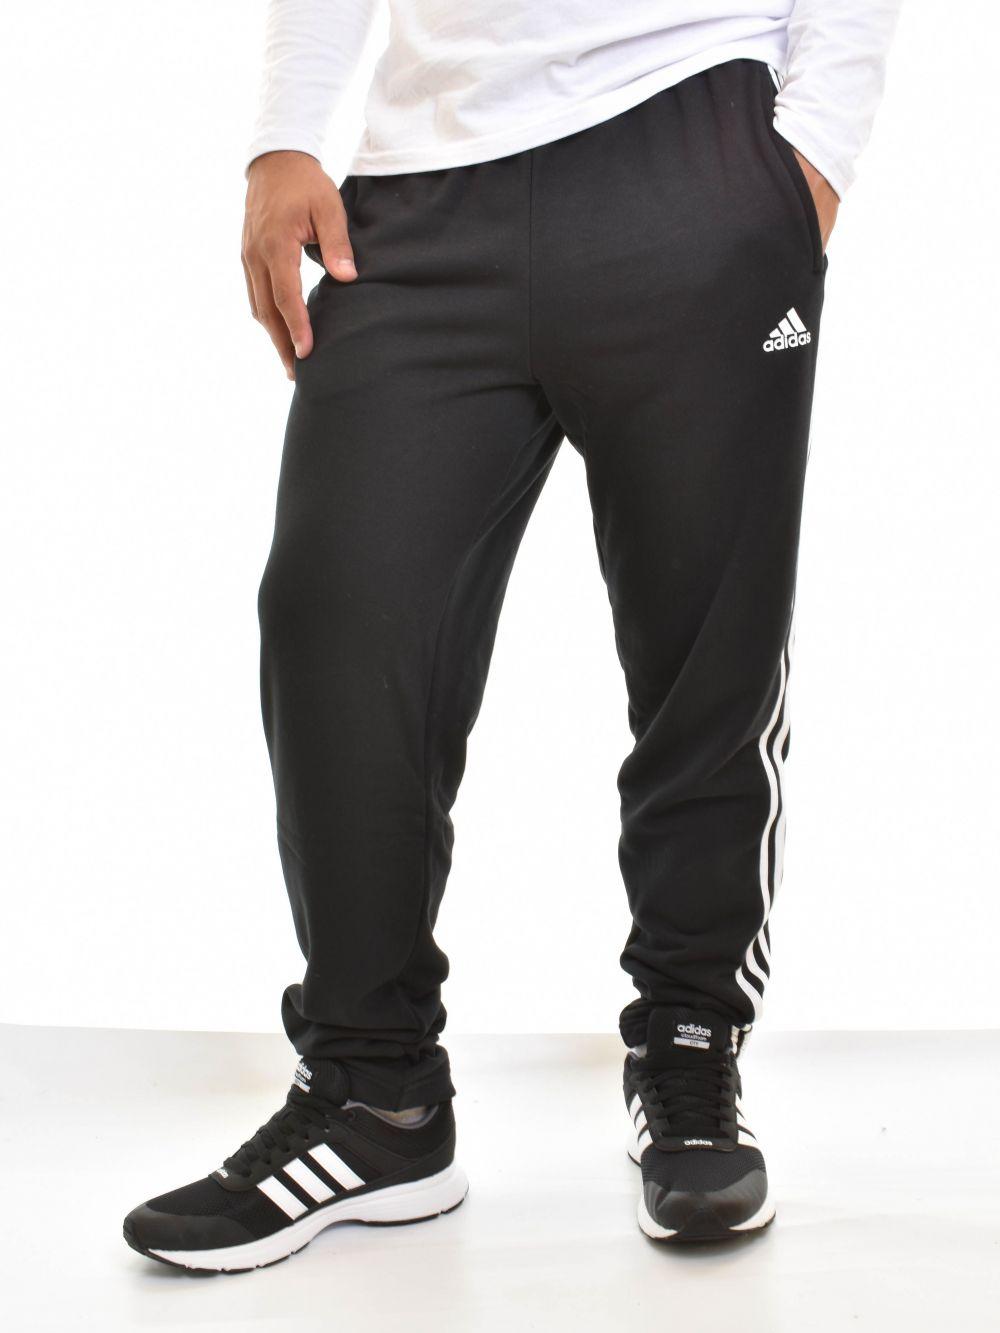 Adidas férfi jogging alsó ESS 3S T PNT FT